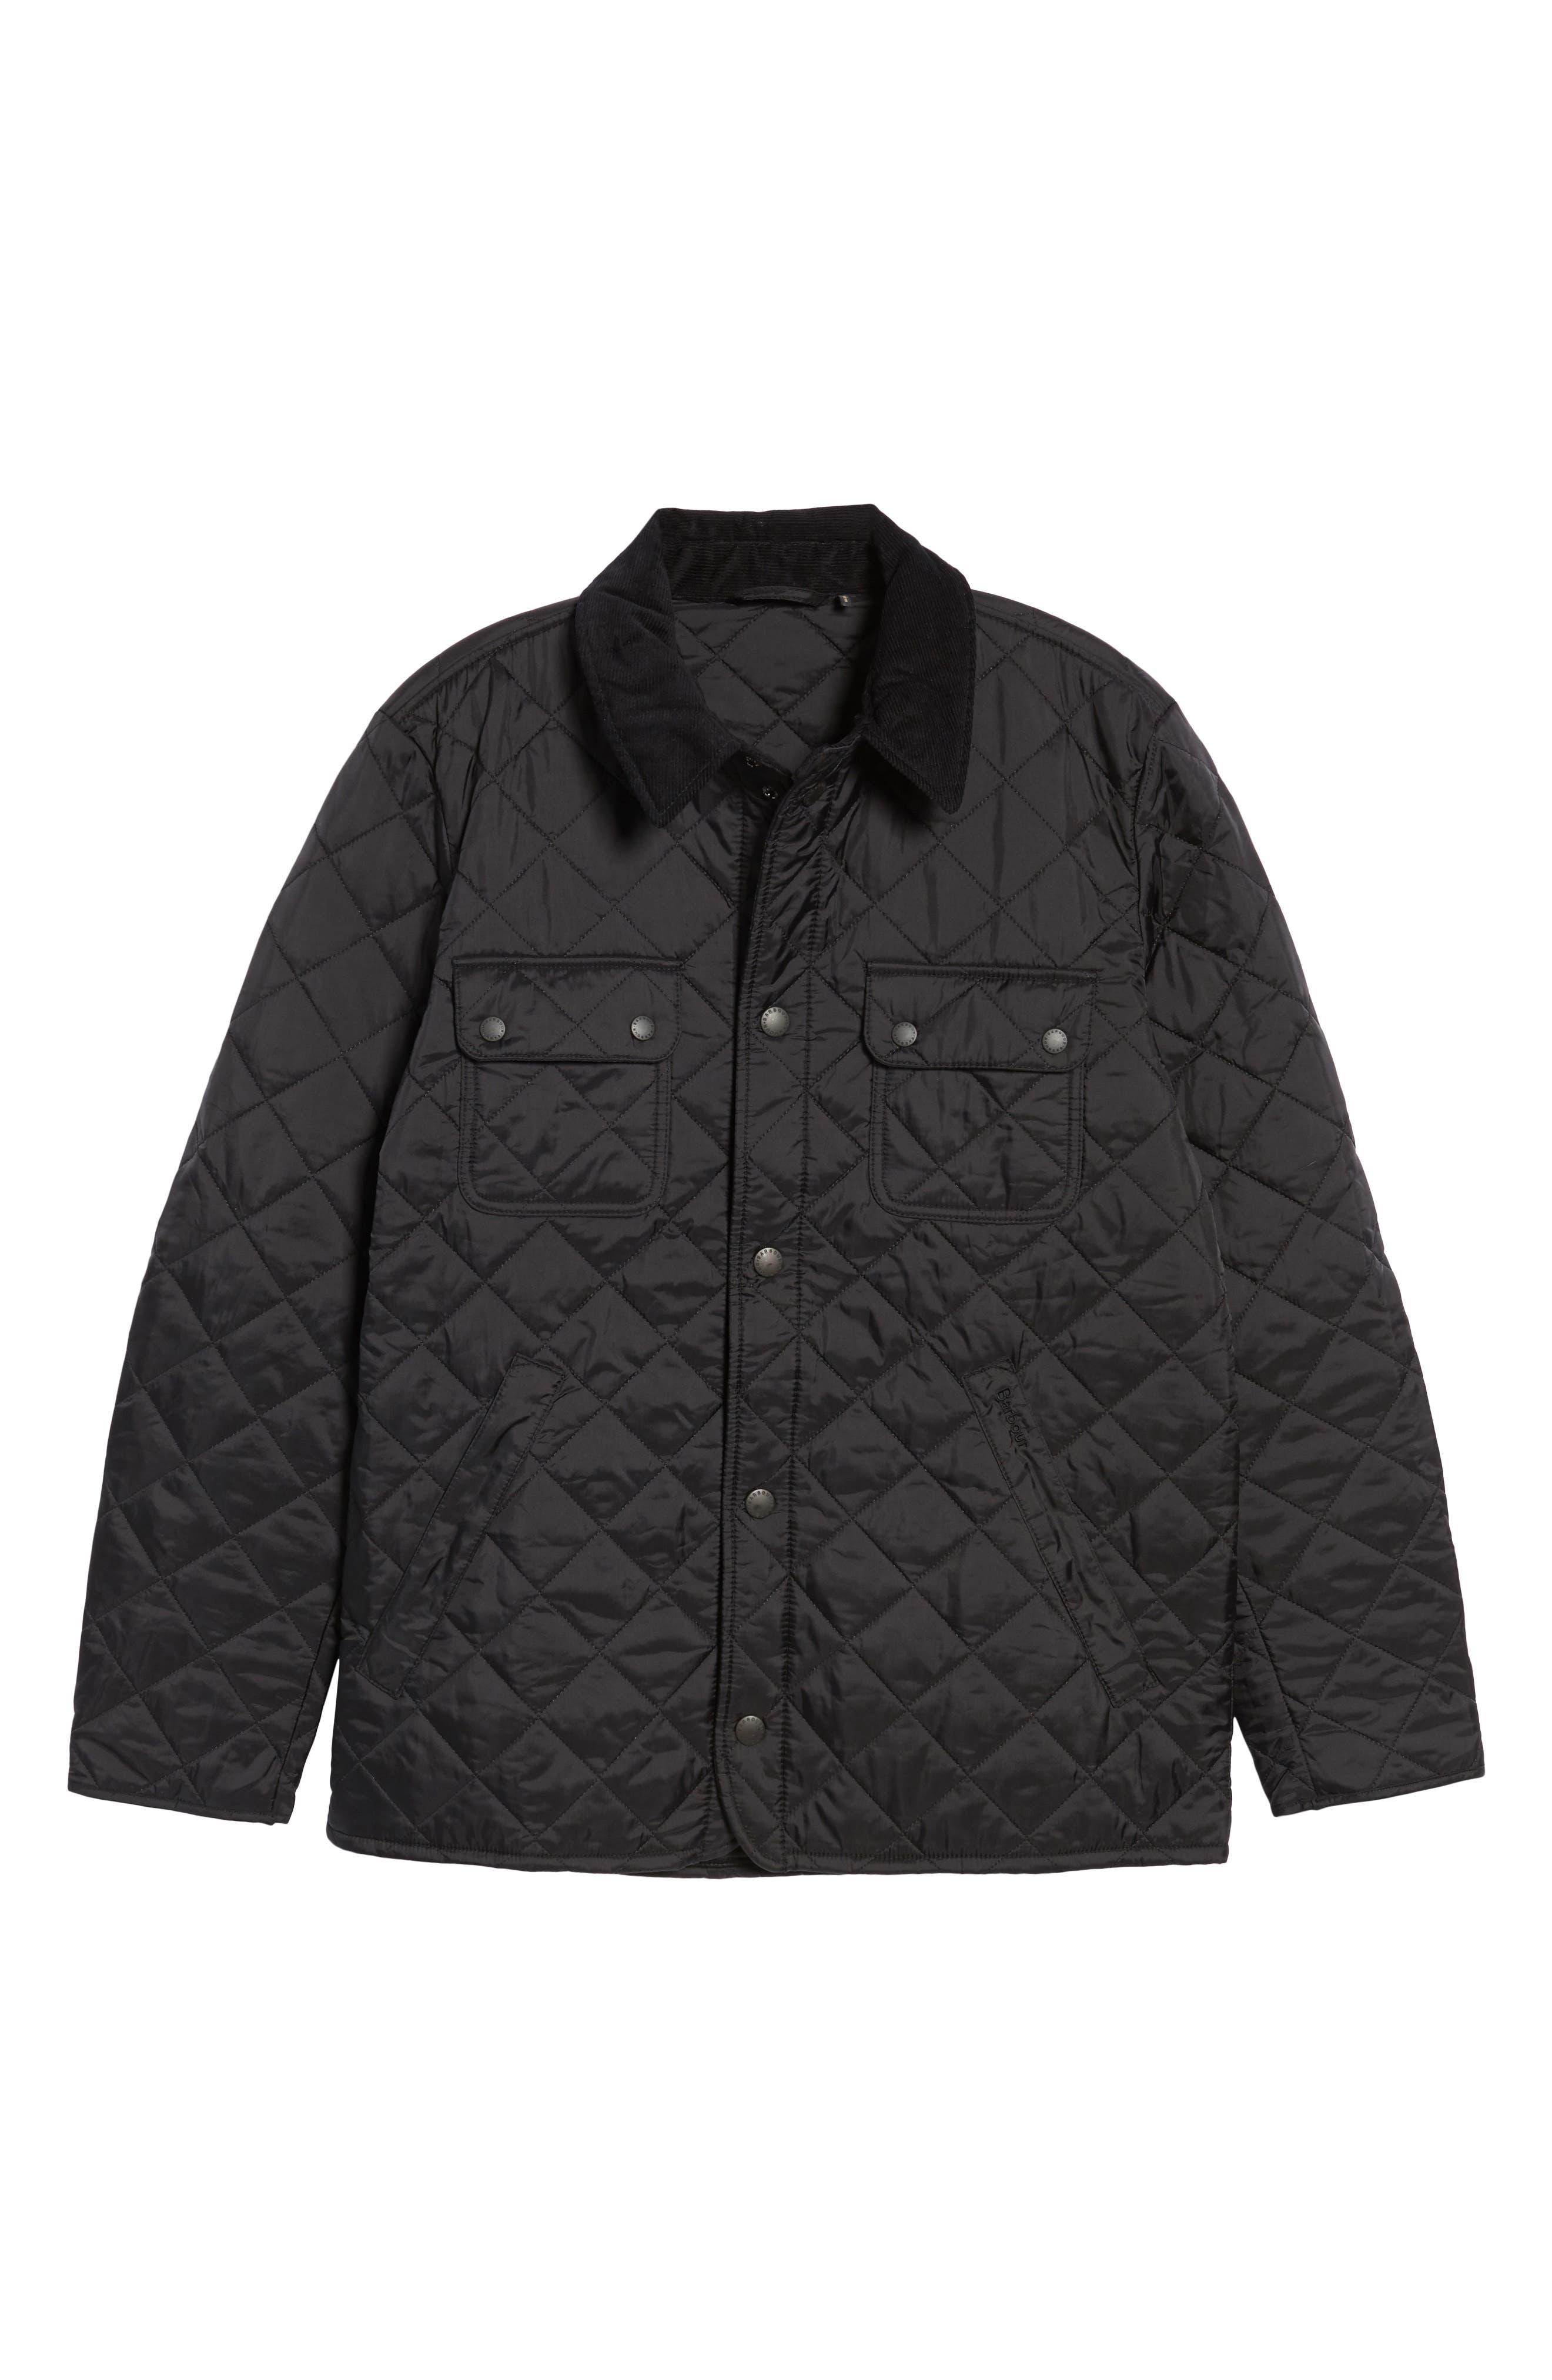 BARBOUR 'Tinford' Regular Fit Quilted Jacket, Main, color, 001